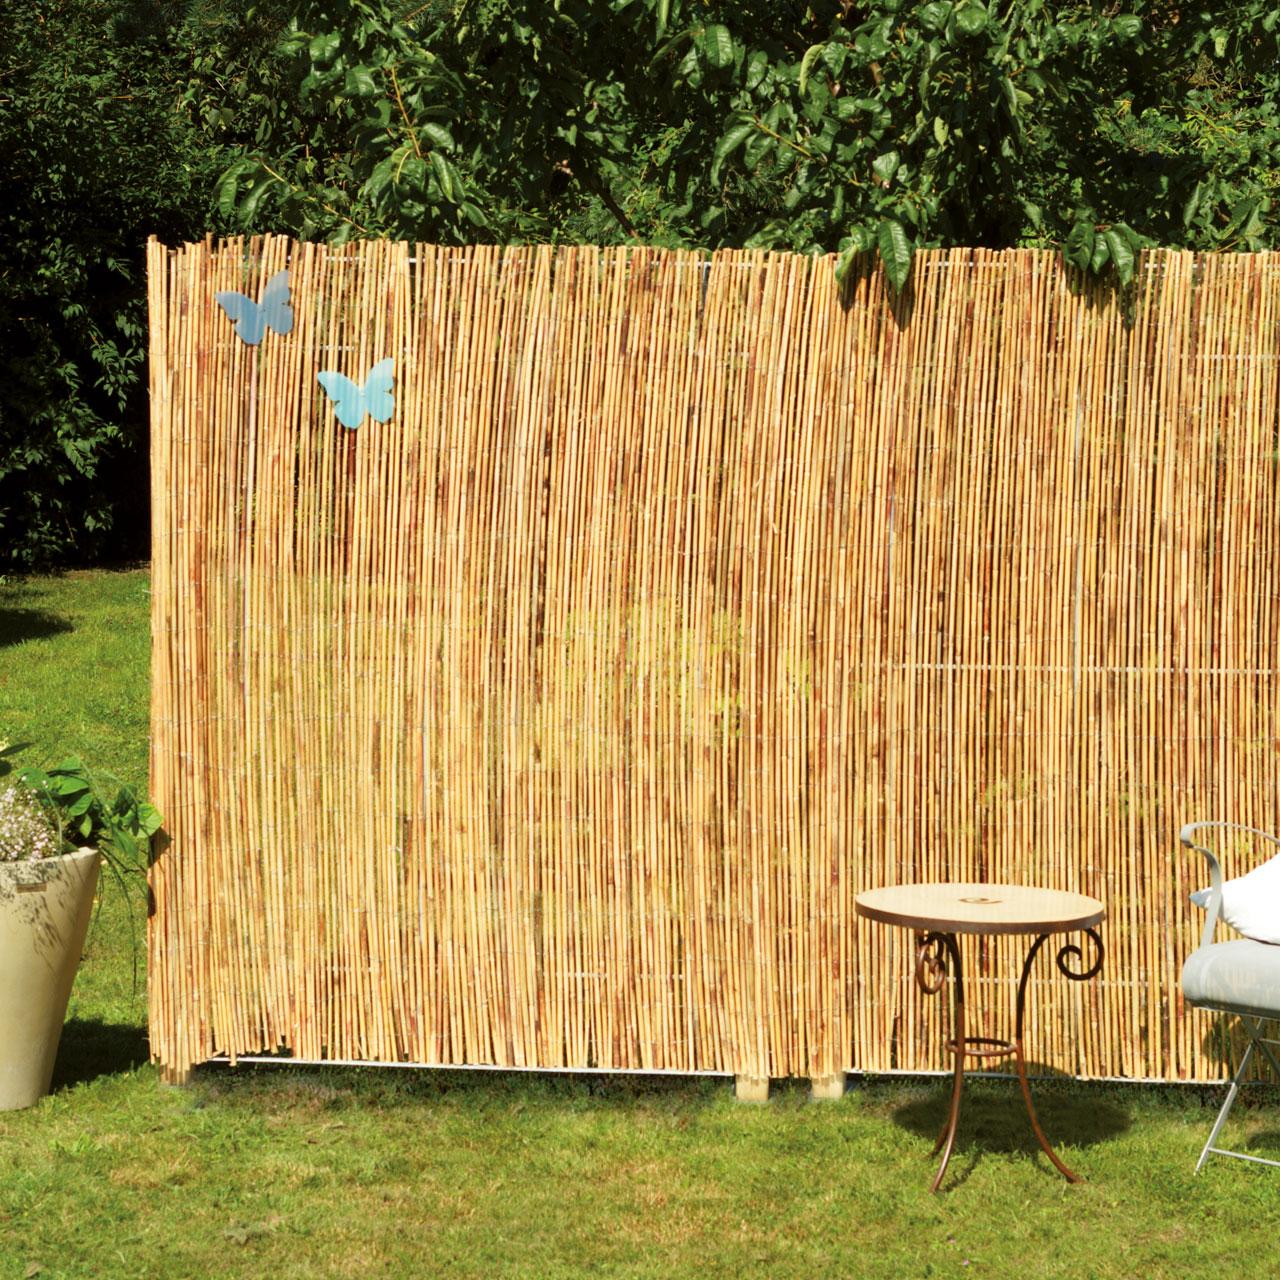 bambusmatte gef llt sichtschutzzaun macao natur. Black Bedroom Furniture Sets. Home Design Ideas